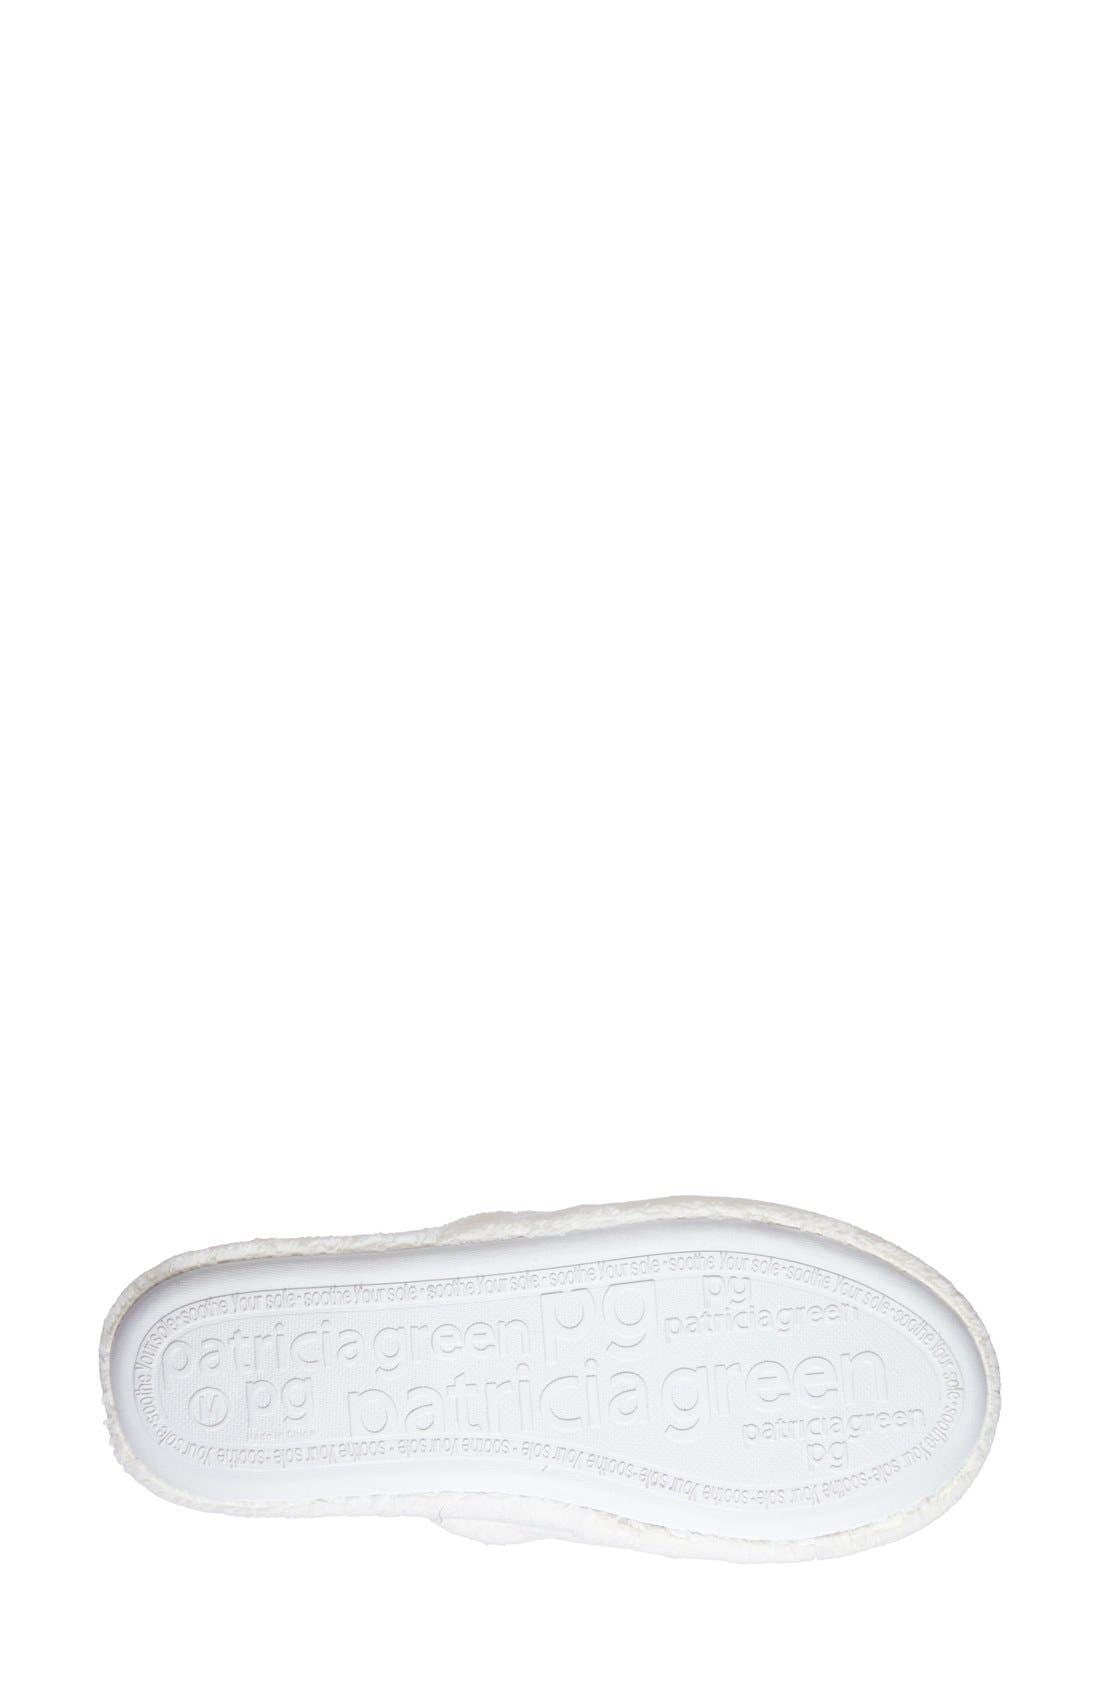 'Bonnie' Bow Slipper,                             Alternate thumbnail 4, color,                             WHITE